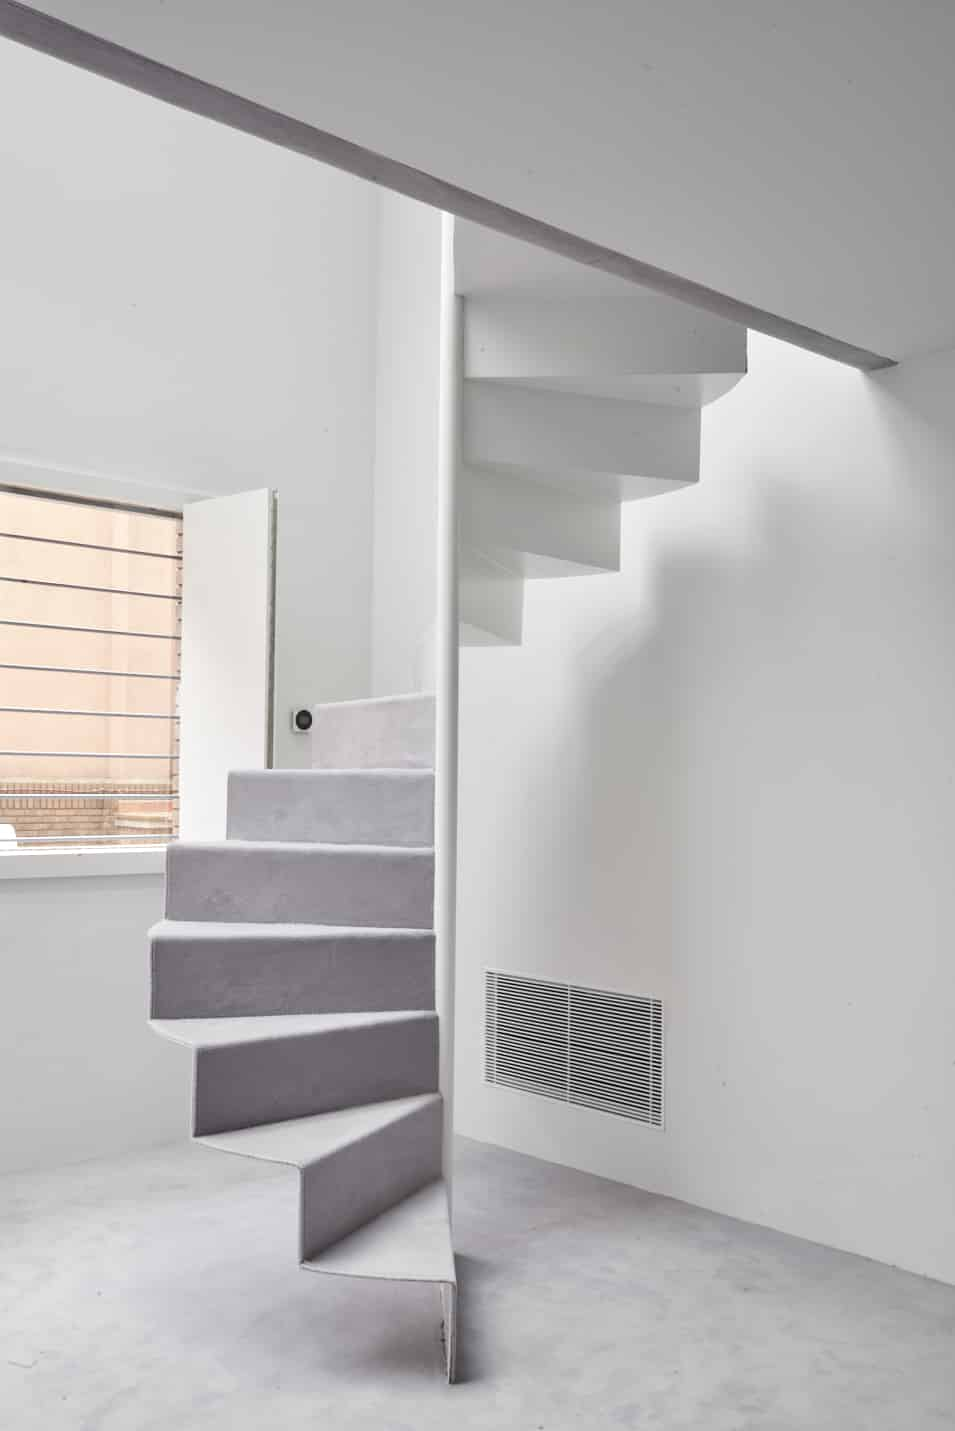 Casa Omar  - 02.1 ArquitecturaG CasaOmar 35